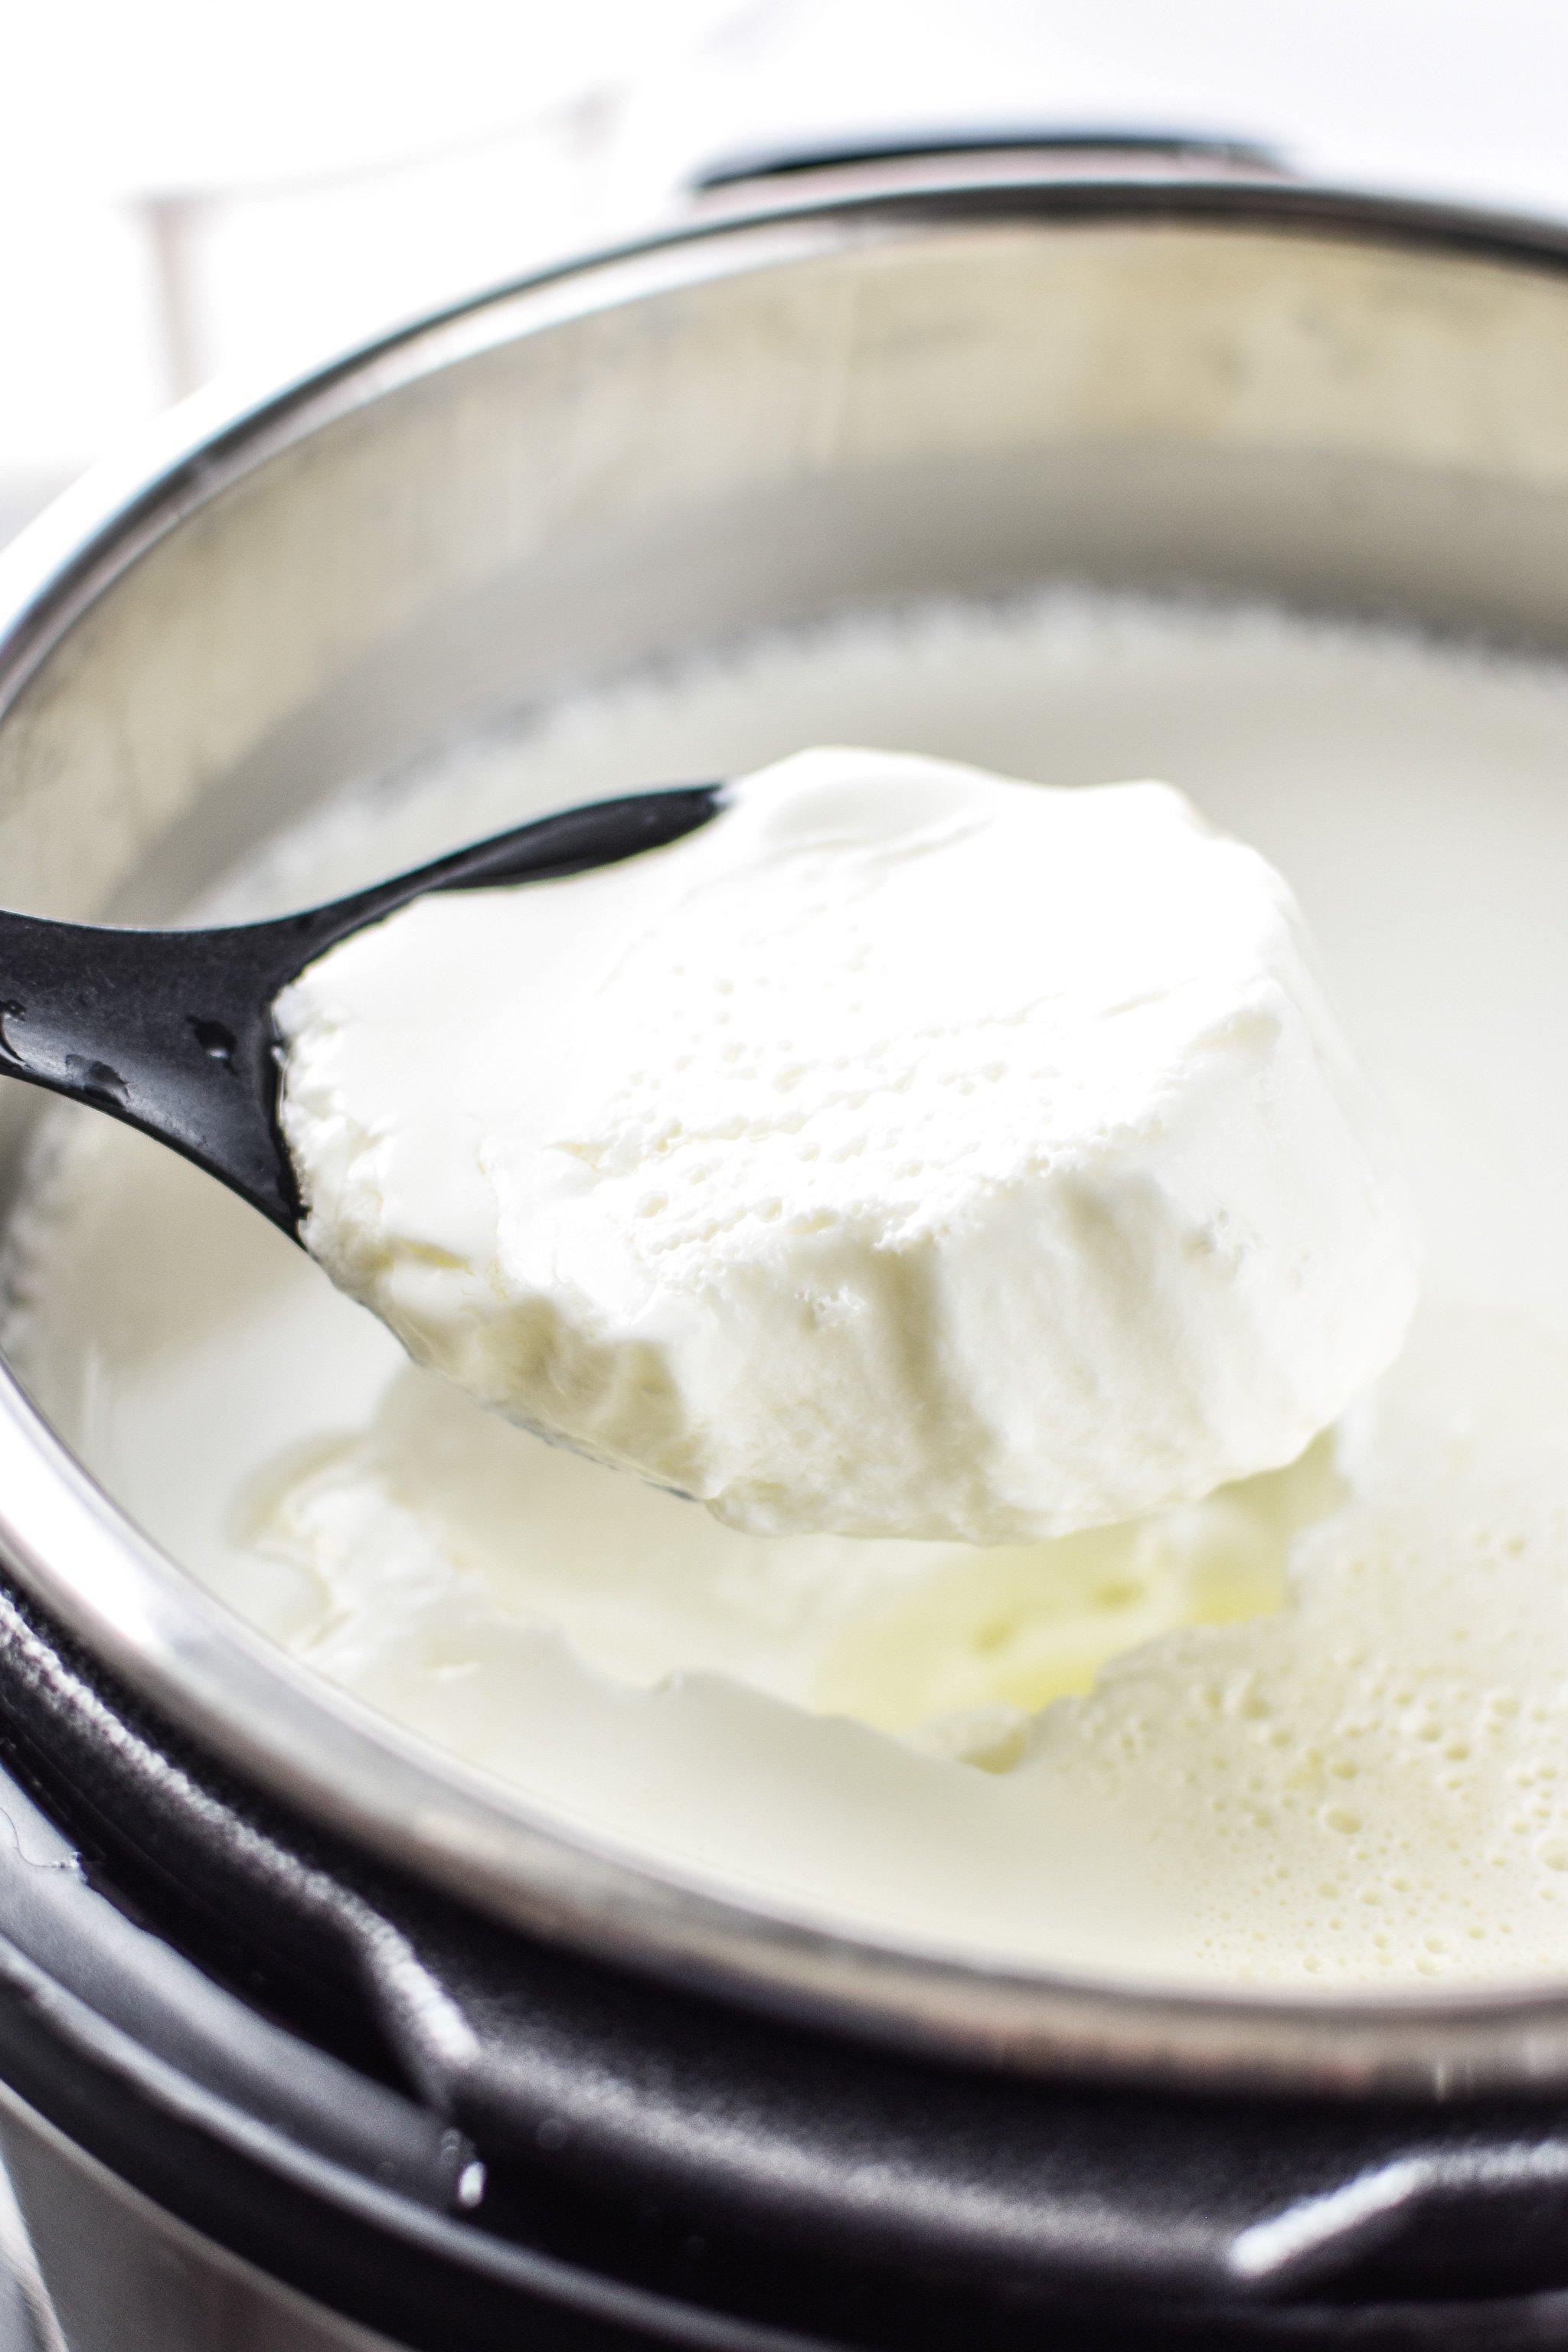 A spoonful of freshly made Instant Pot yogurt